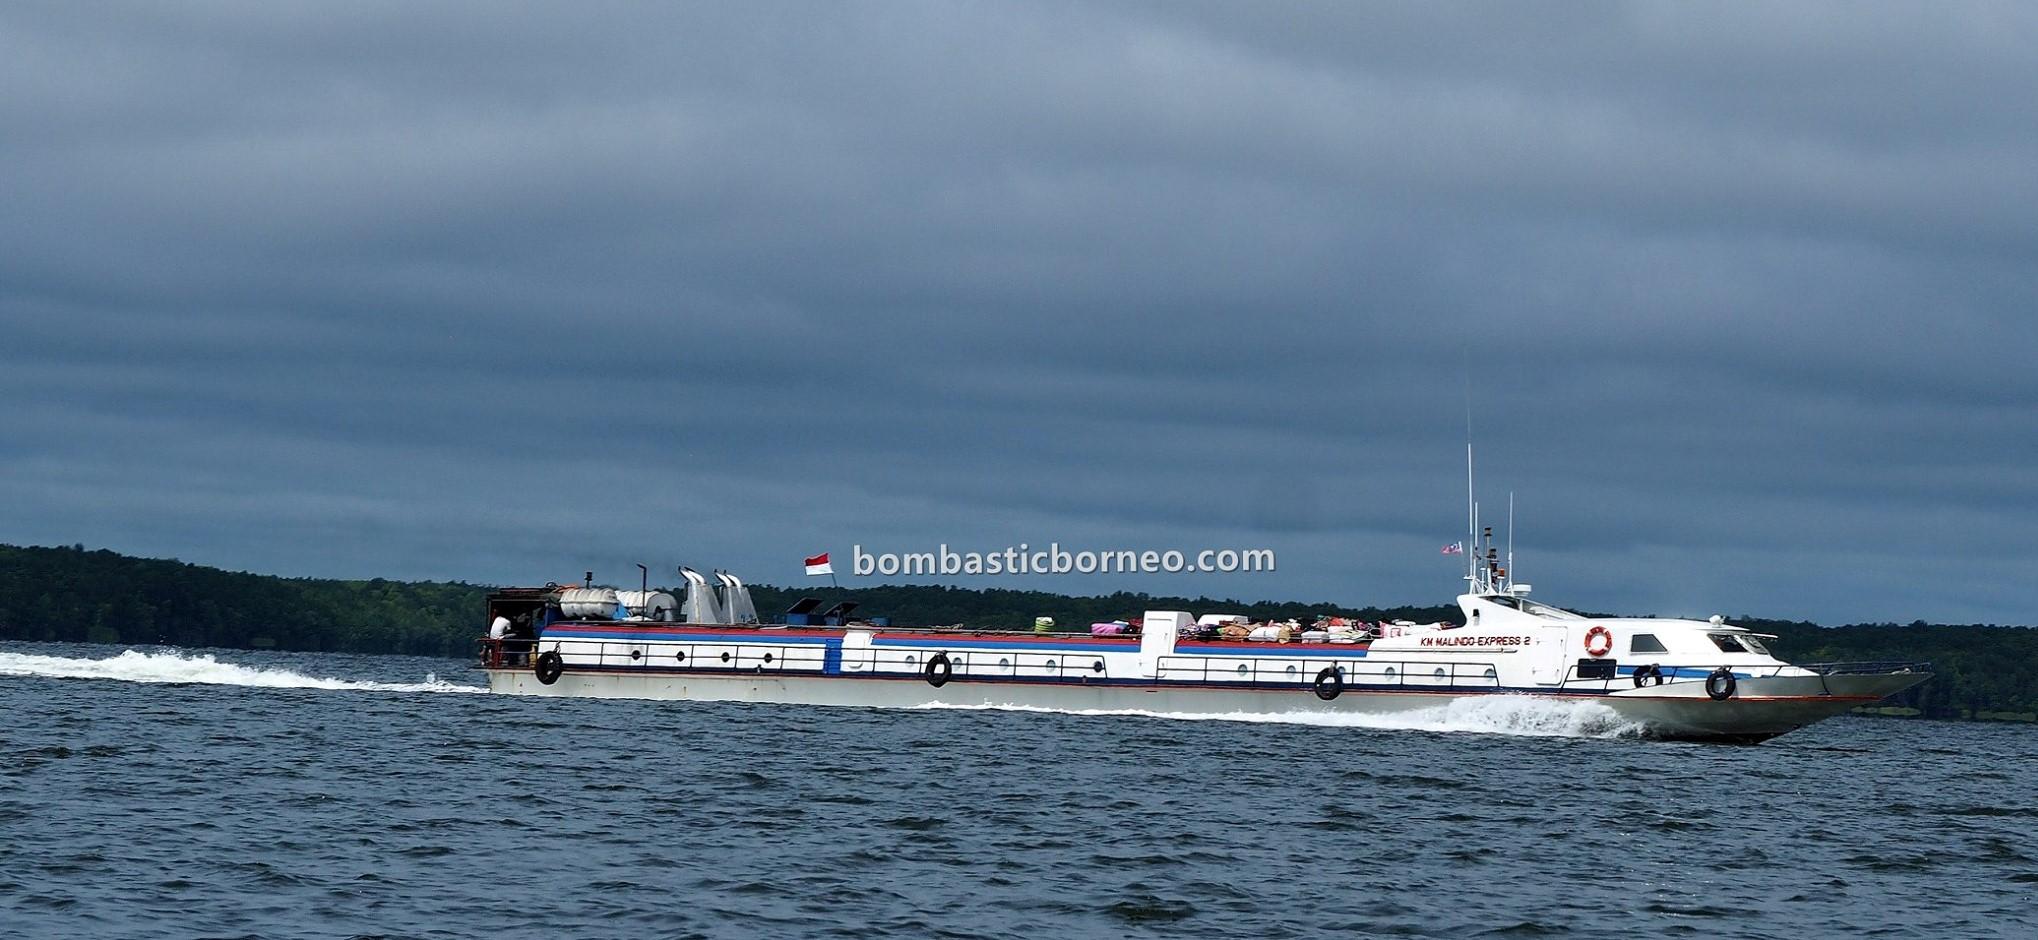 Pulau Sebatik, Island, boat ride, jelajah, exploration, Indonesia, adventure, backpackers, Kalimantan Utara, tourism, Travel Guide, Trans Border, 跨境婆罗洲游踪, 马来西亚沙巴斗湖